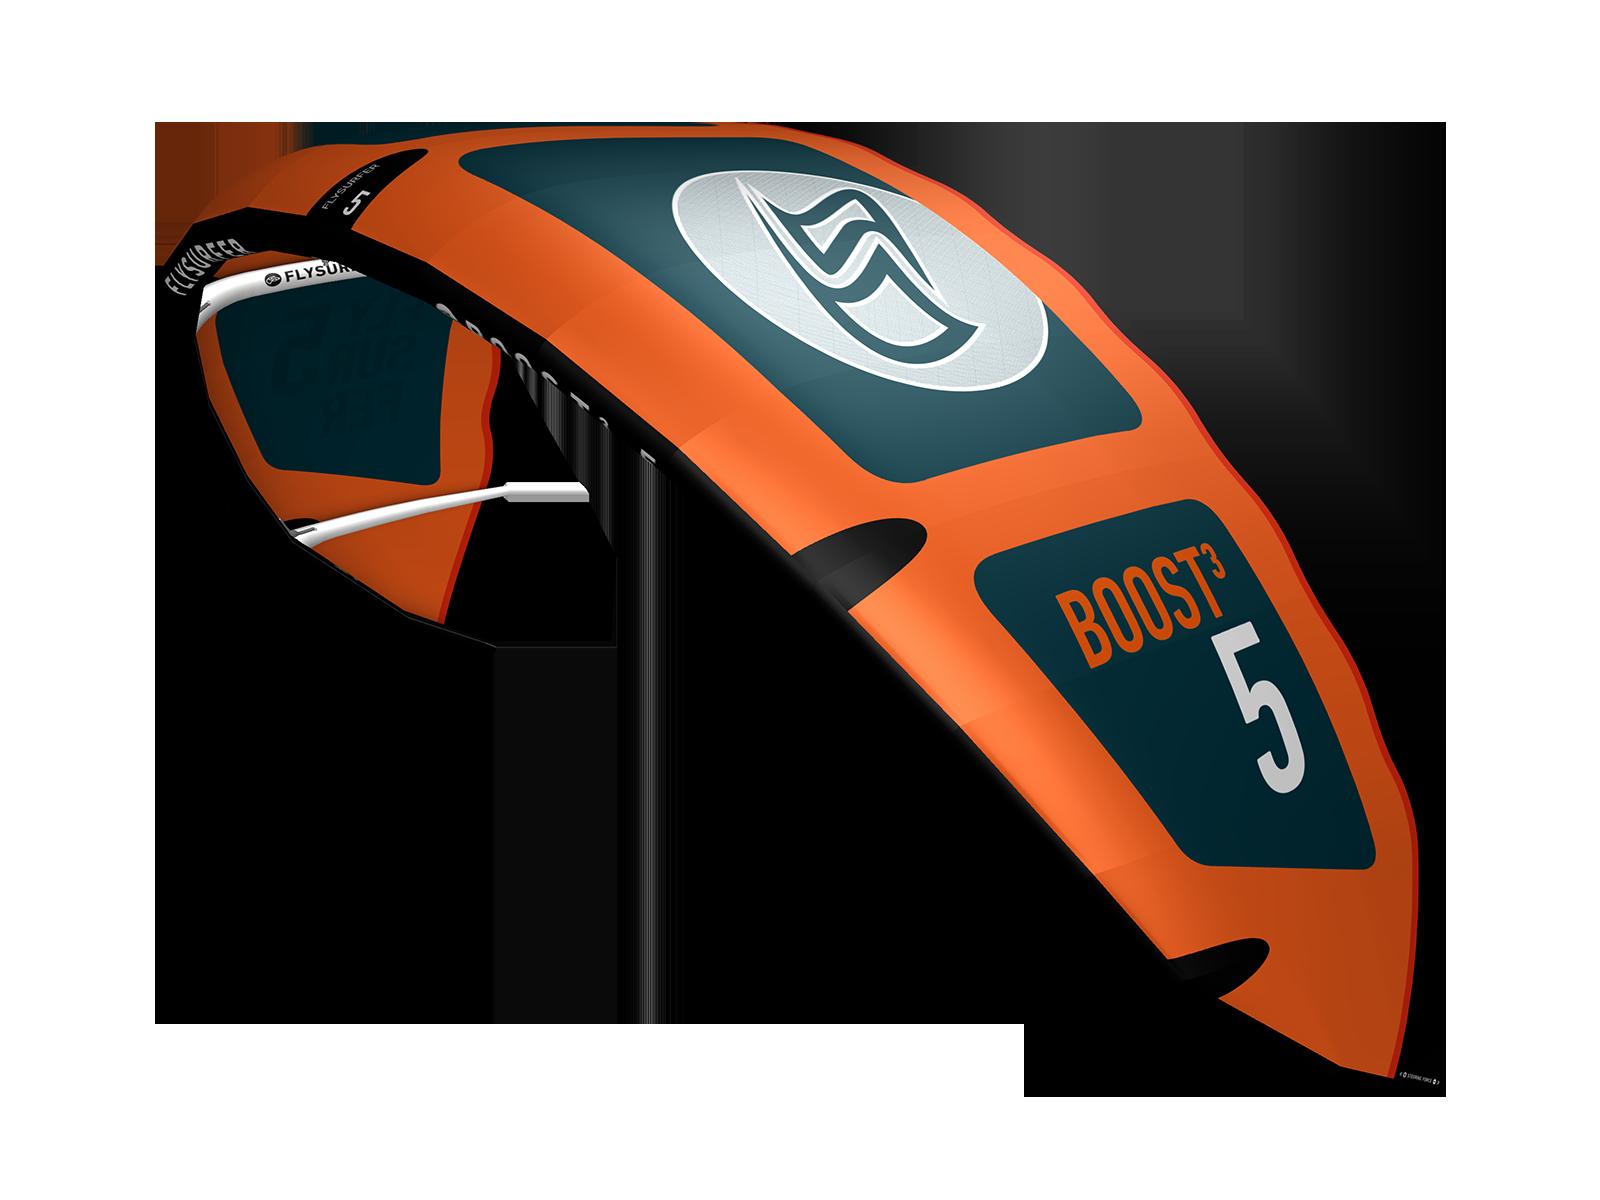 BOOST3-3D-05 Kiteflow